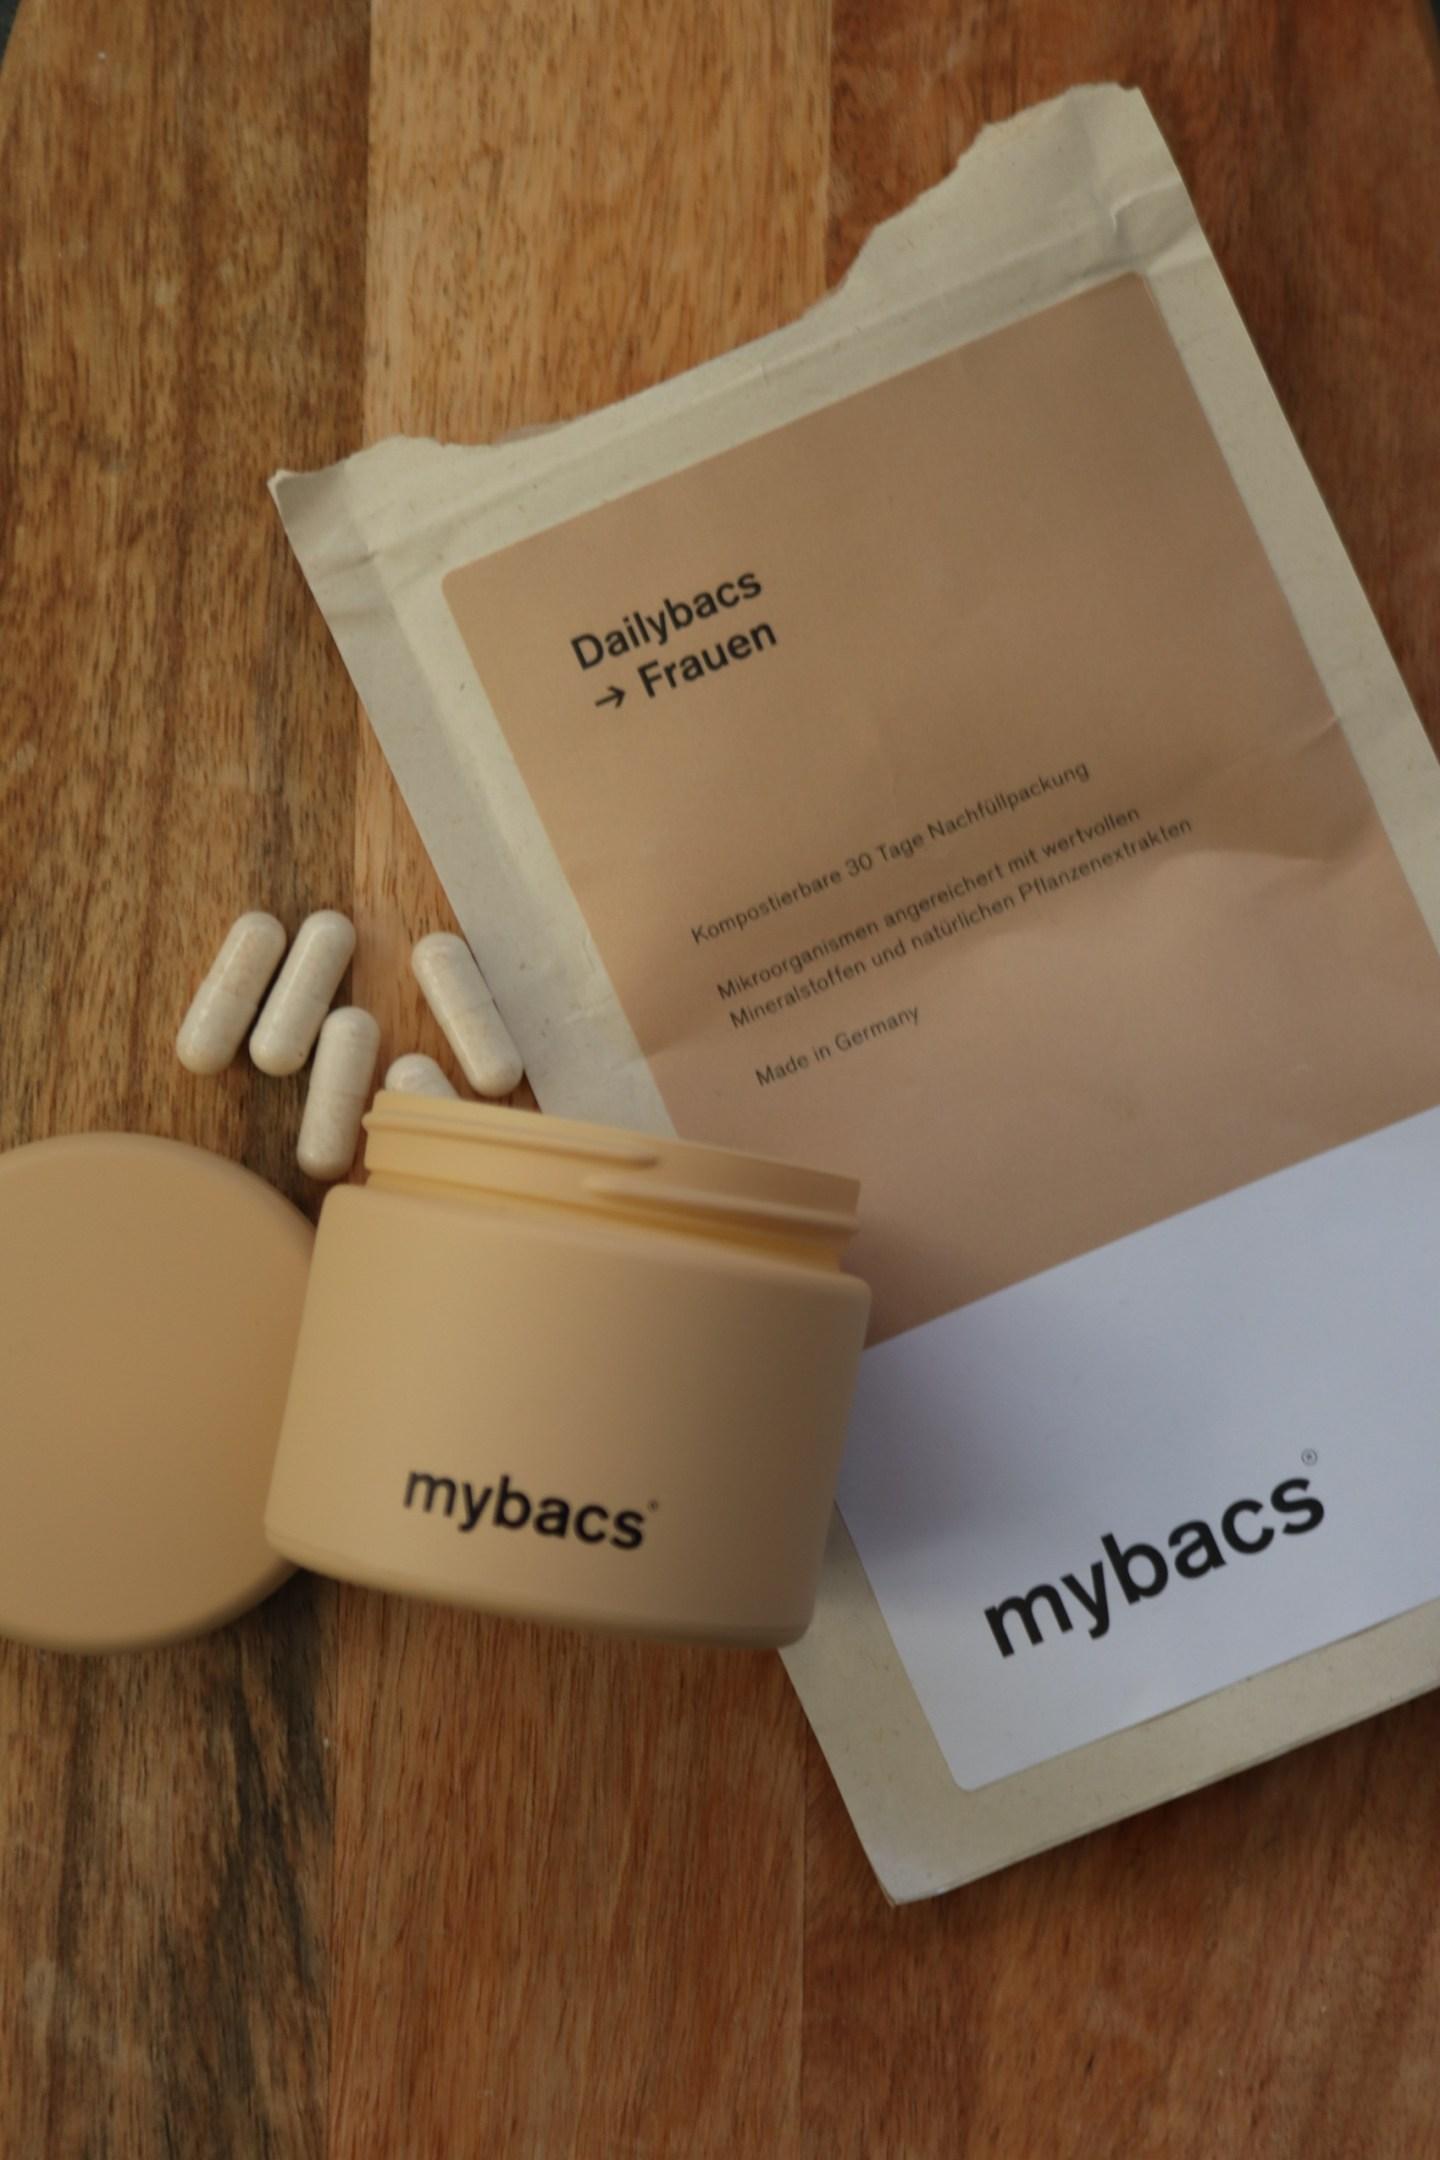 glamupyourlifestyle darmflora verdauung mybacc gesunde Ernaehrung Immunsystem